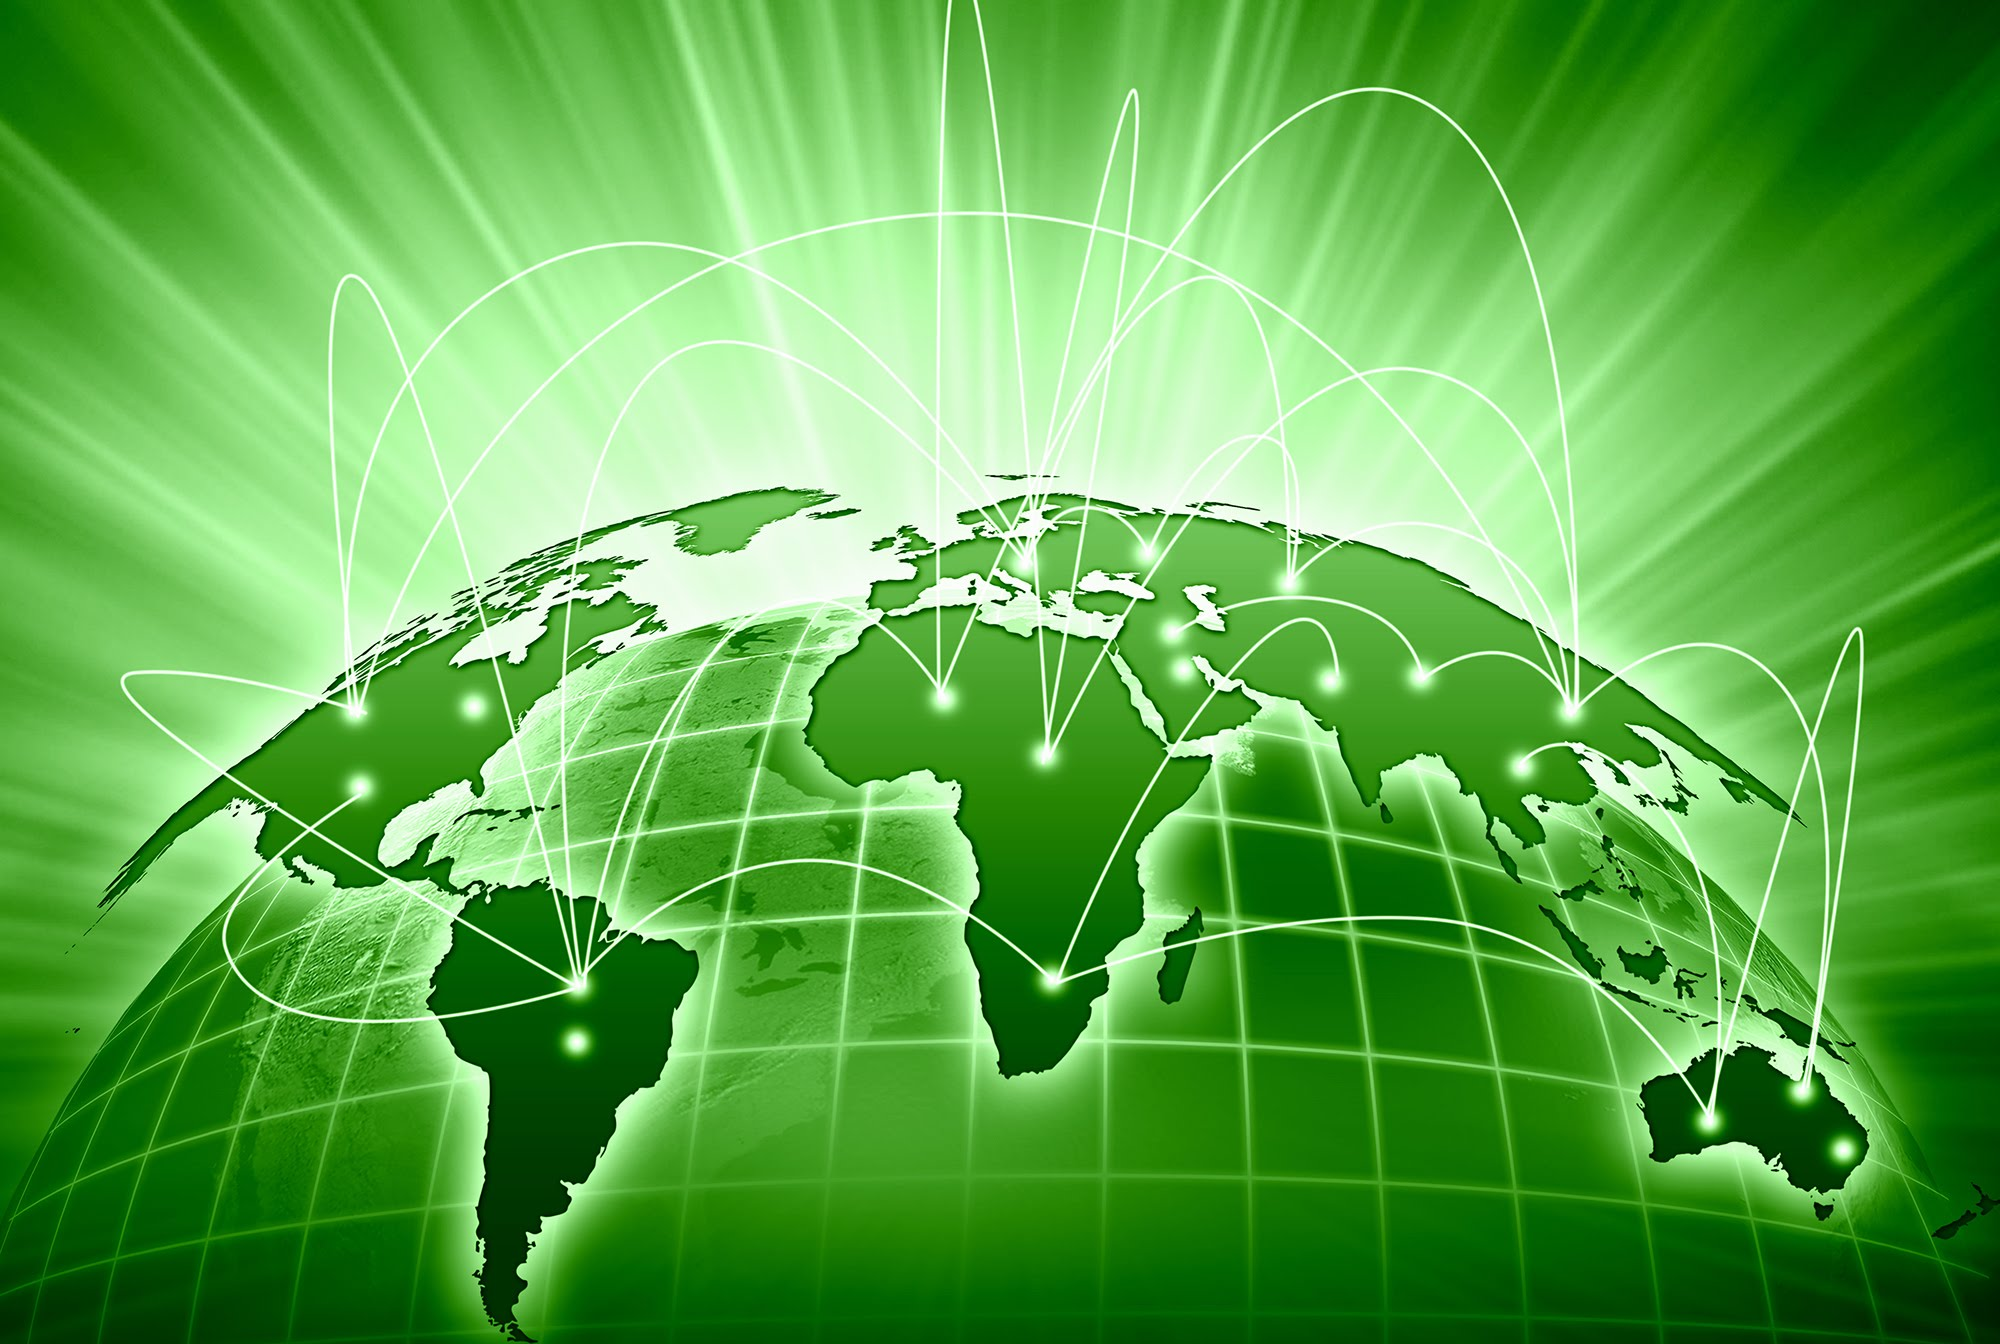 About green economy | UN Environment